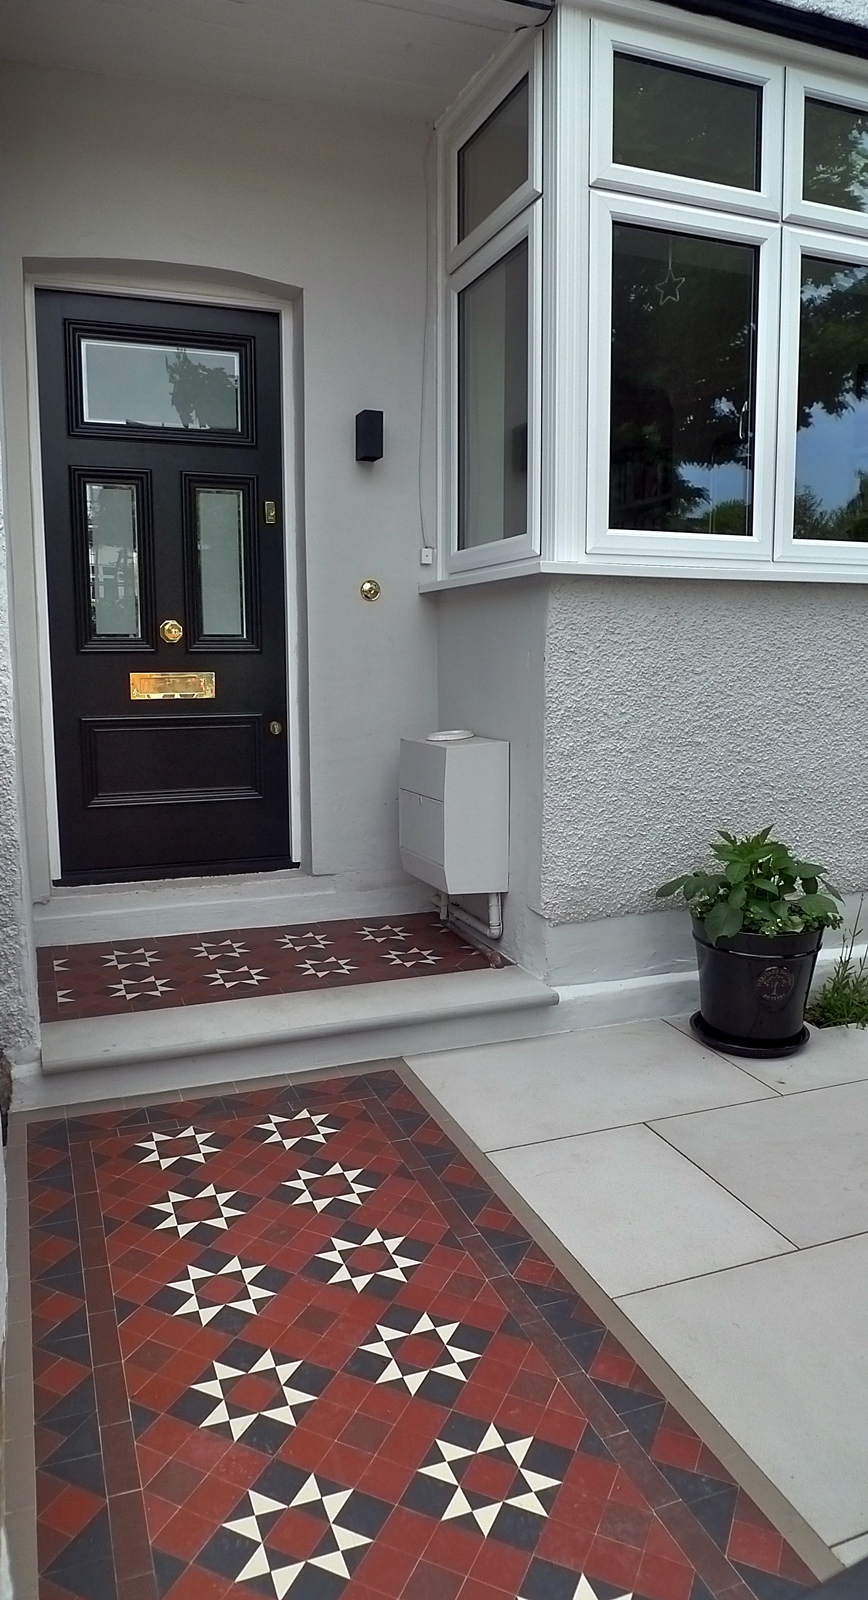 London Garden Blog Page 3 Of 40 London Garden Blog